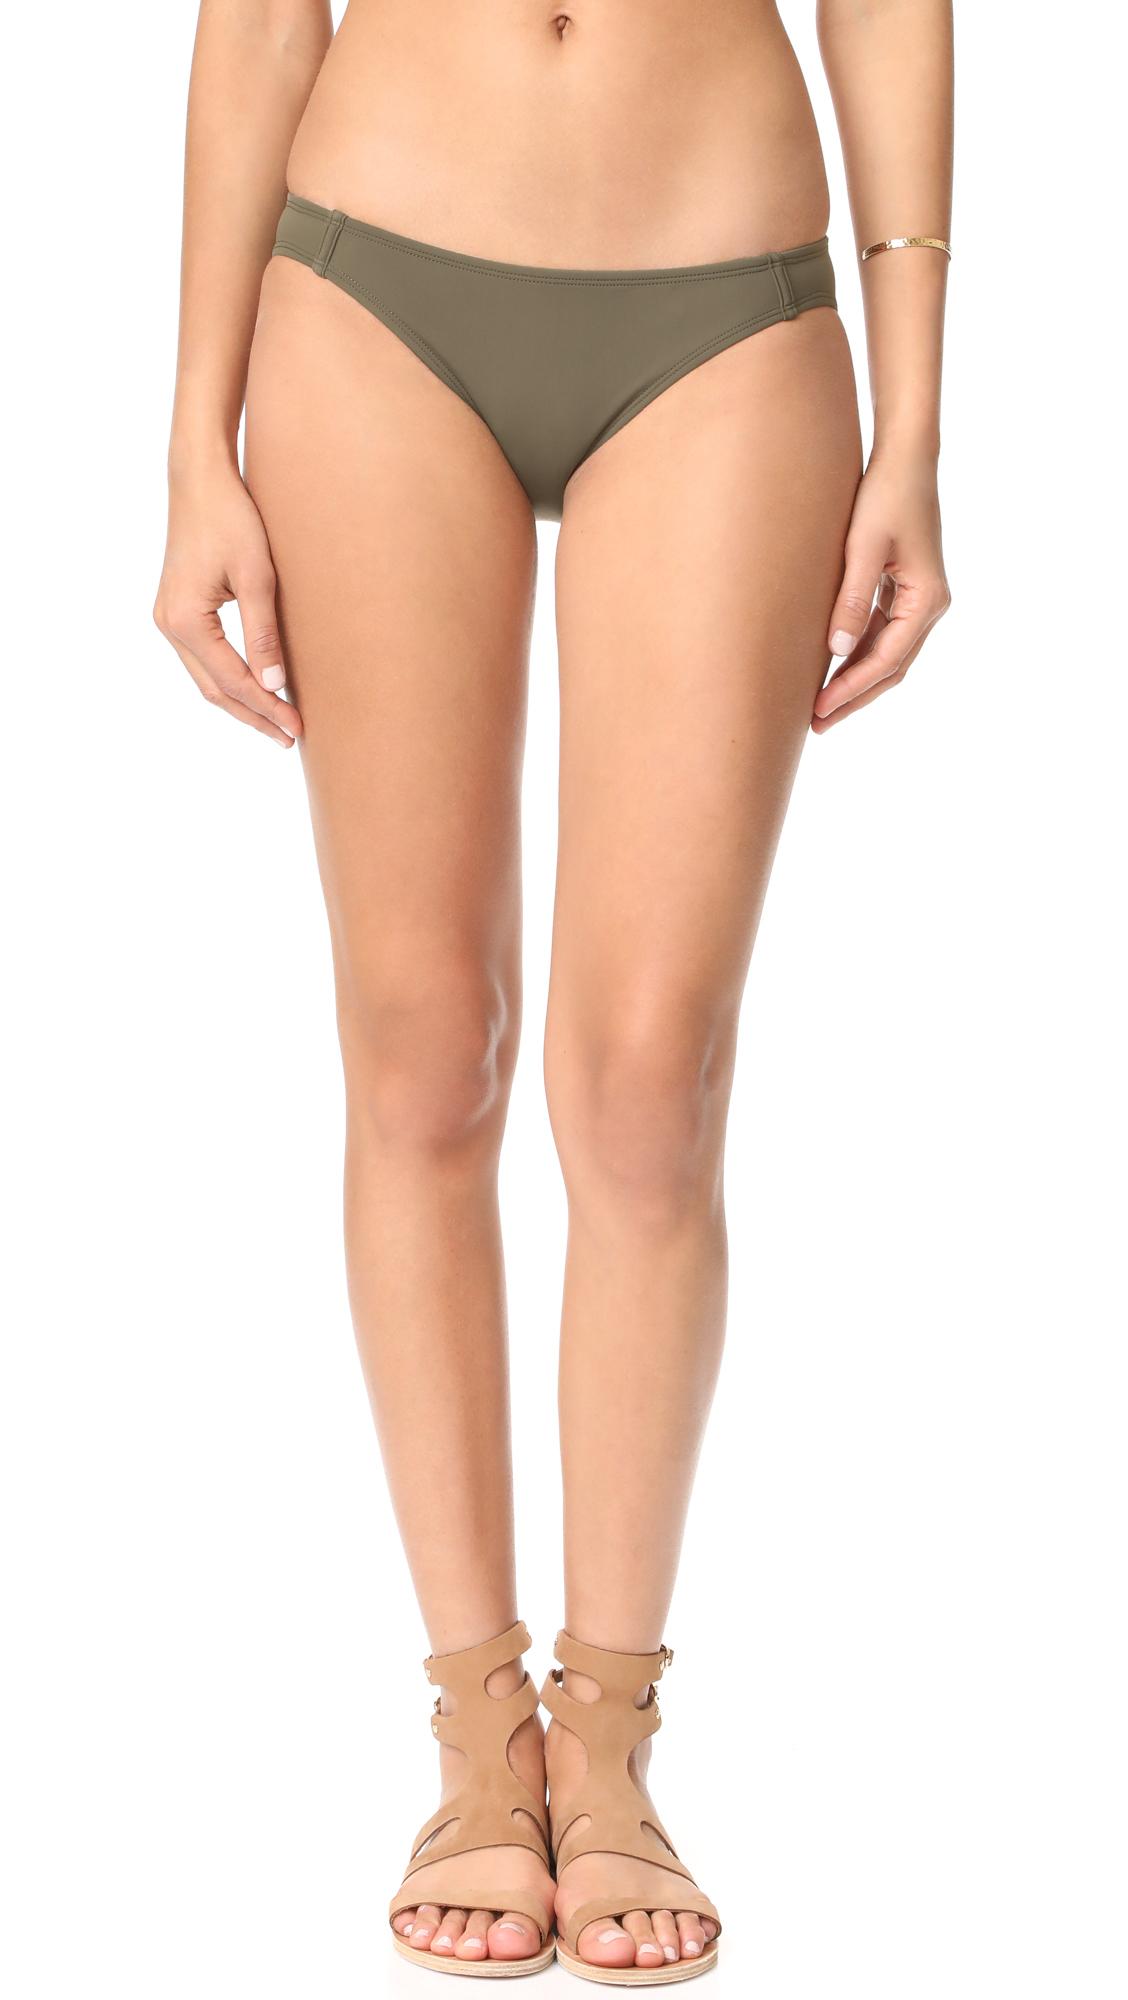 Beth Richards Naomi Bikini Bottoms - Khaki